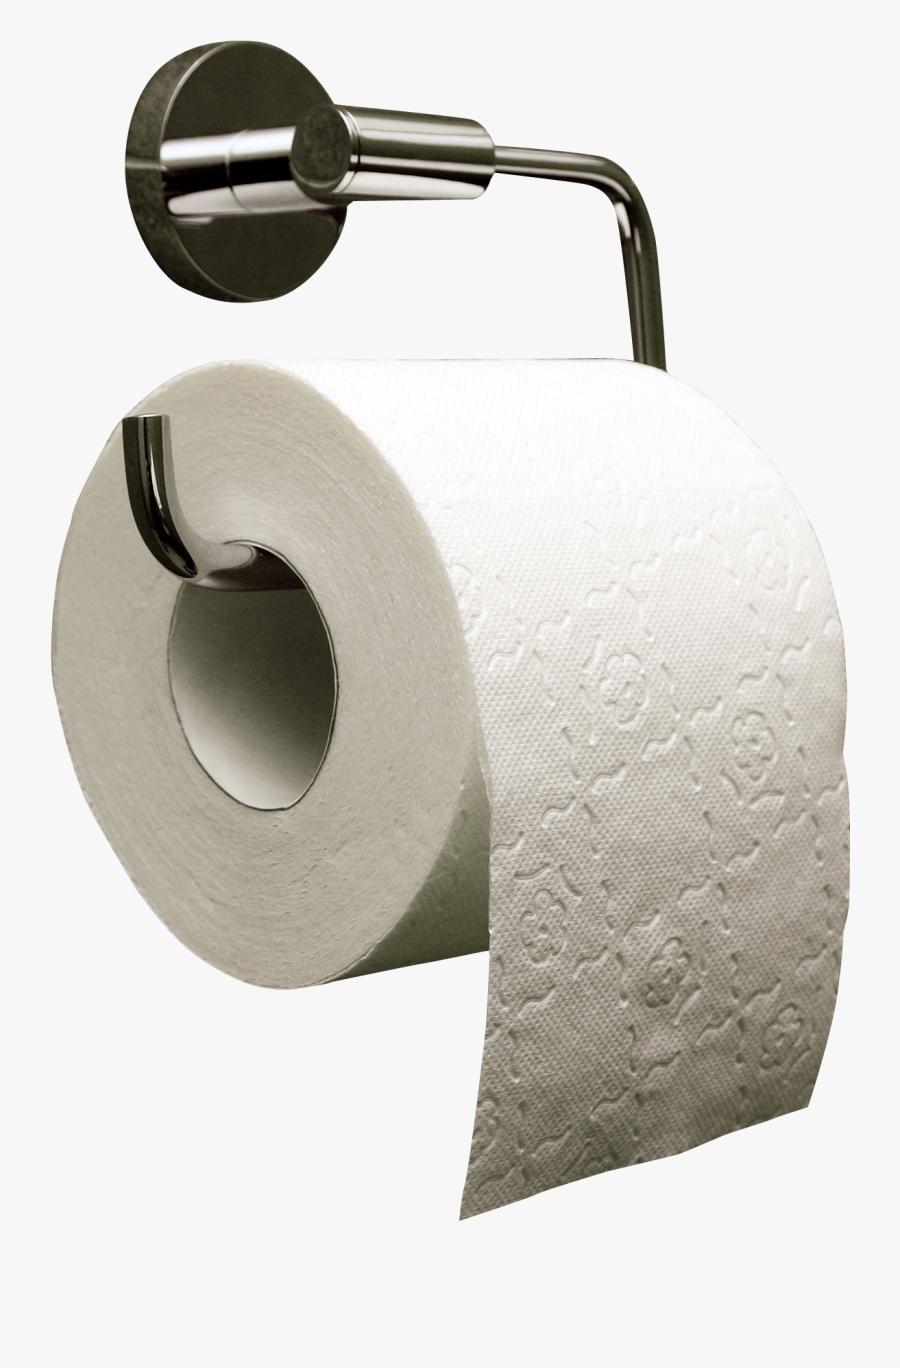 Download Toilet Paper Png Transparent Images Transparent - Toilet Paper Roll Png, Transparent Clipart